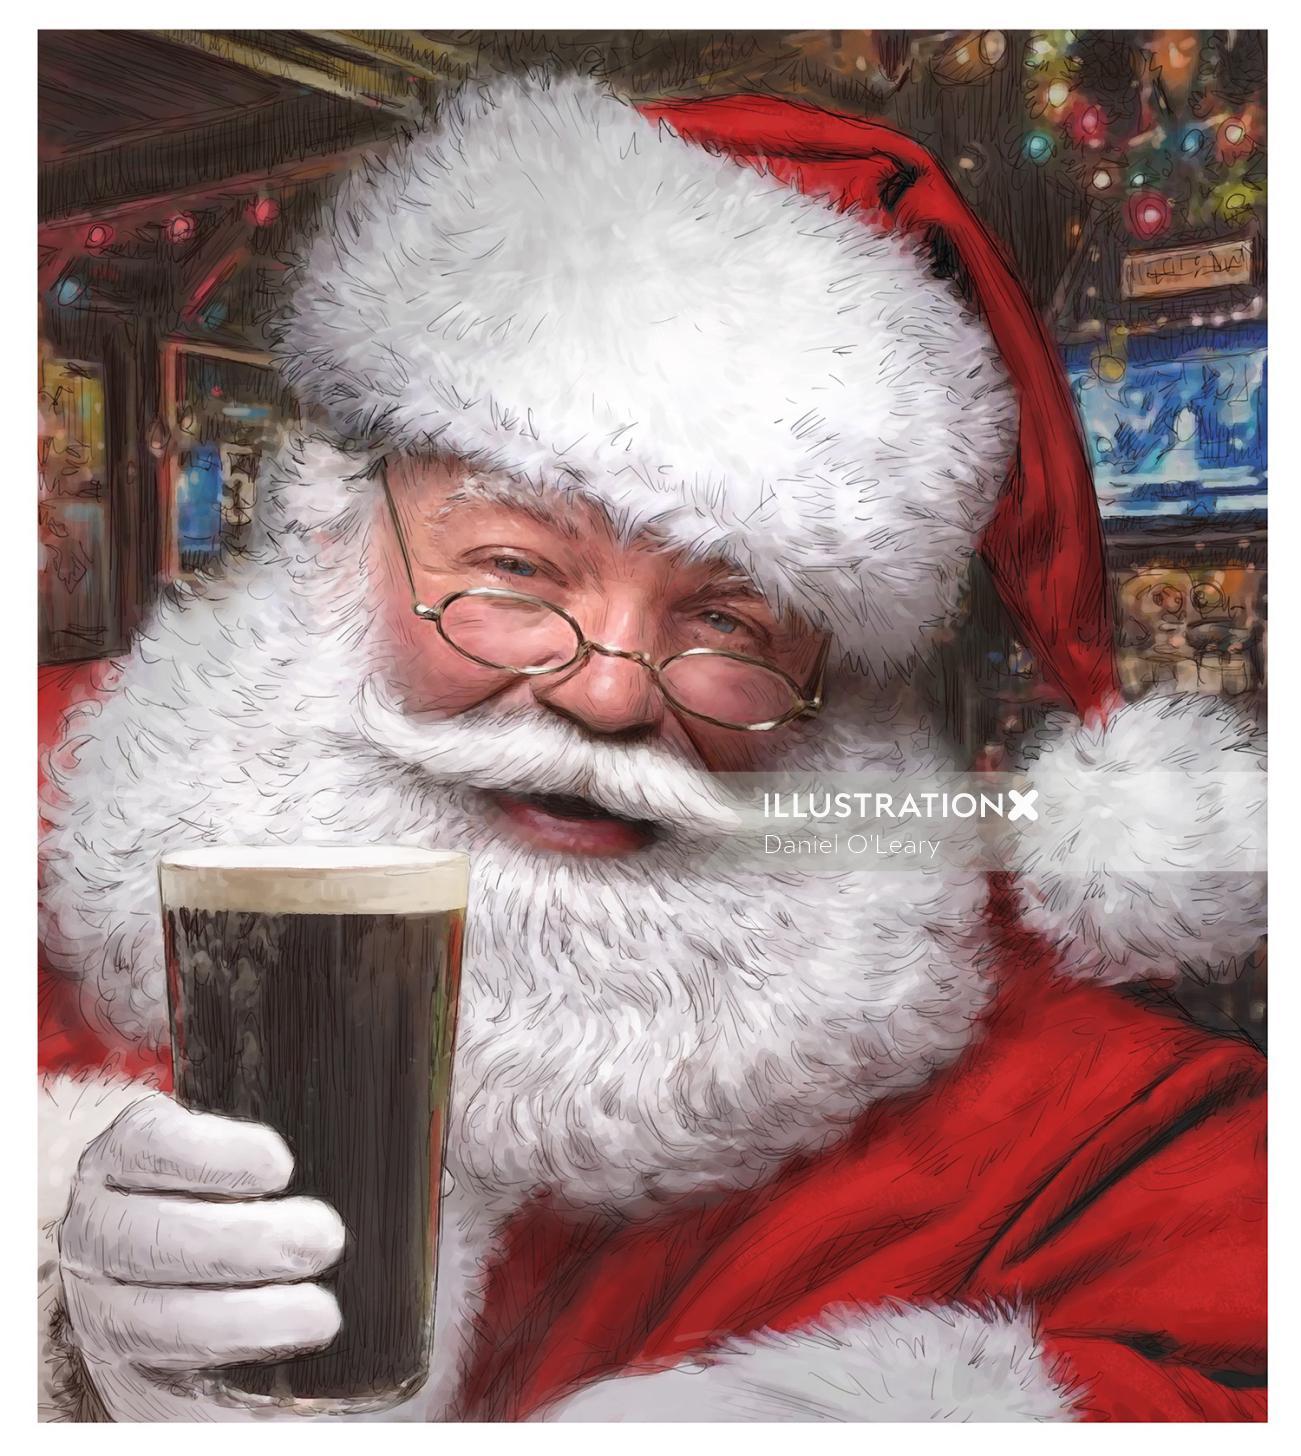 Santaclaus having a pint